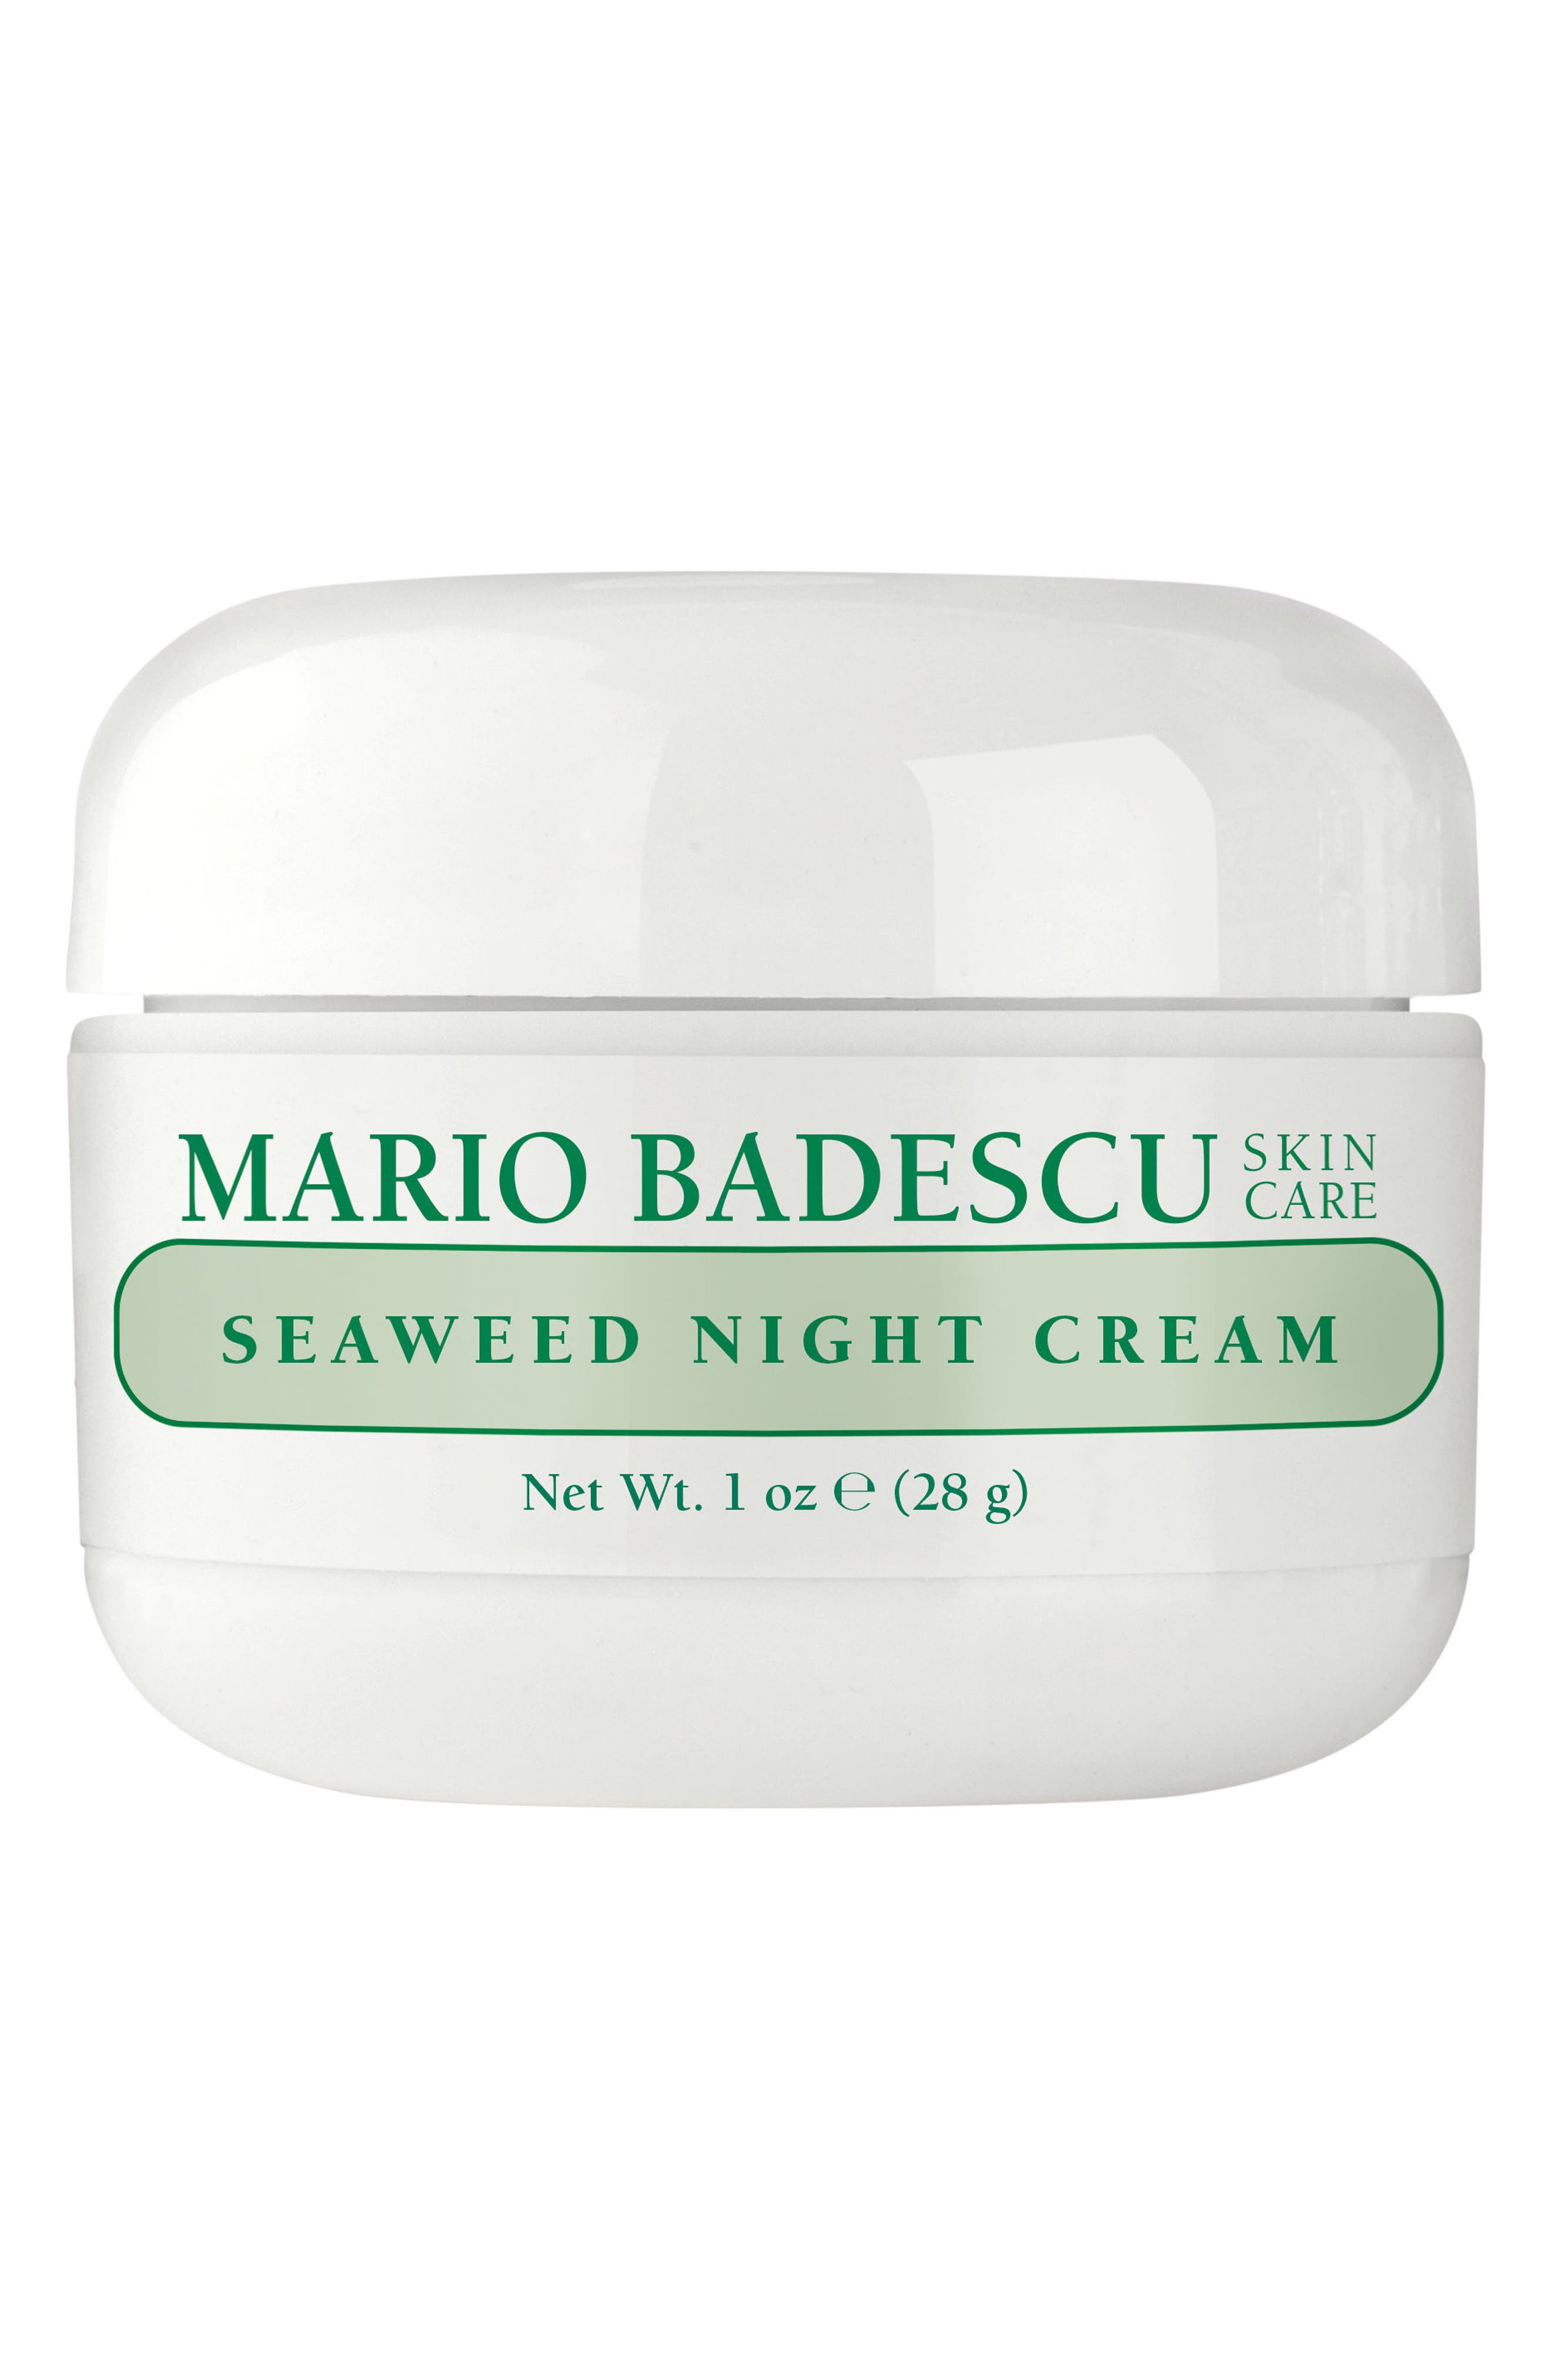 MARIO BADESCU, Seaweed Night Cream, Main thumbnail 1, color, NO COLOR